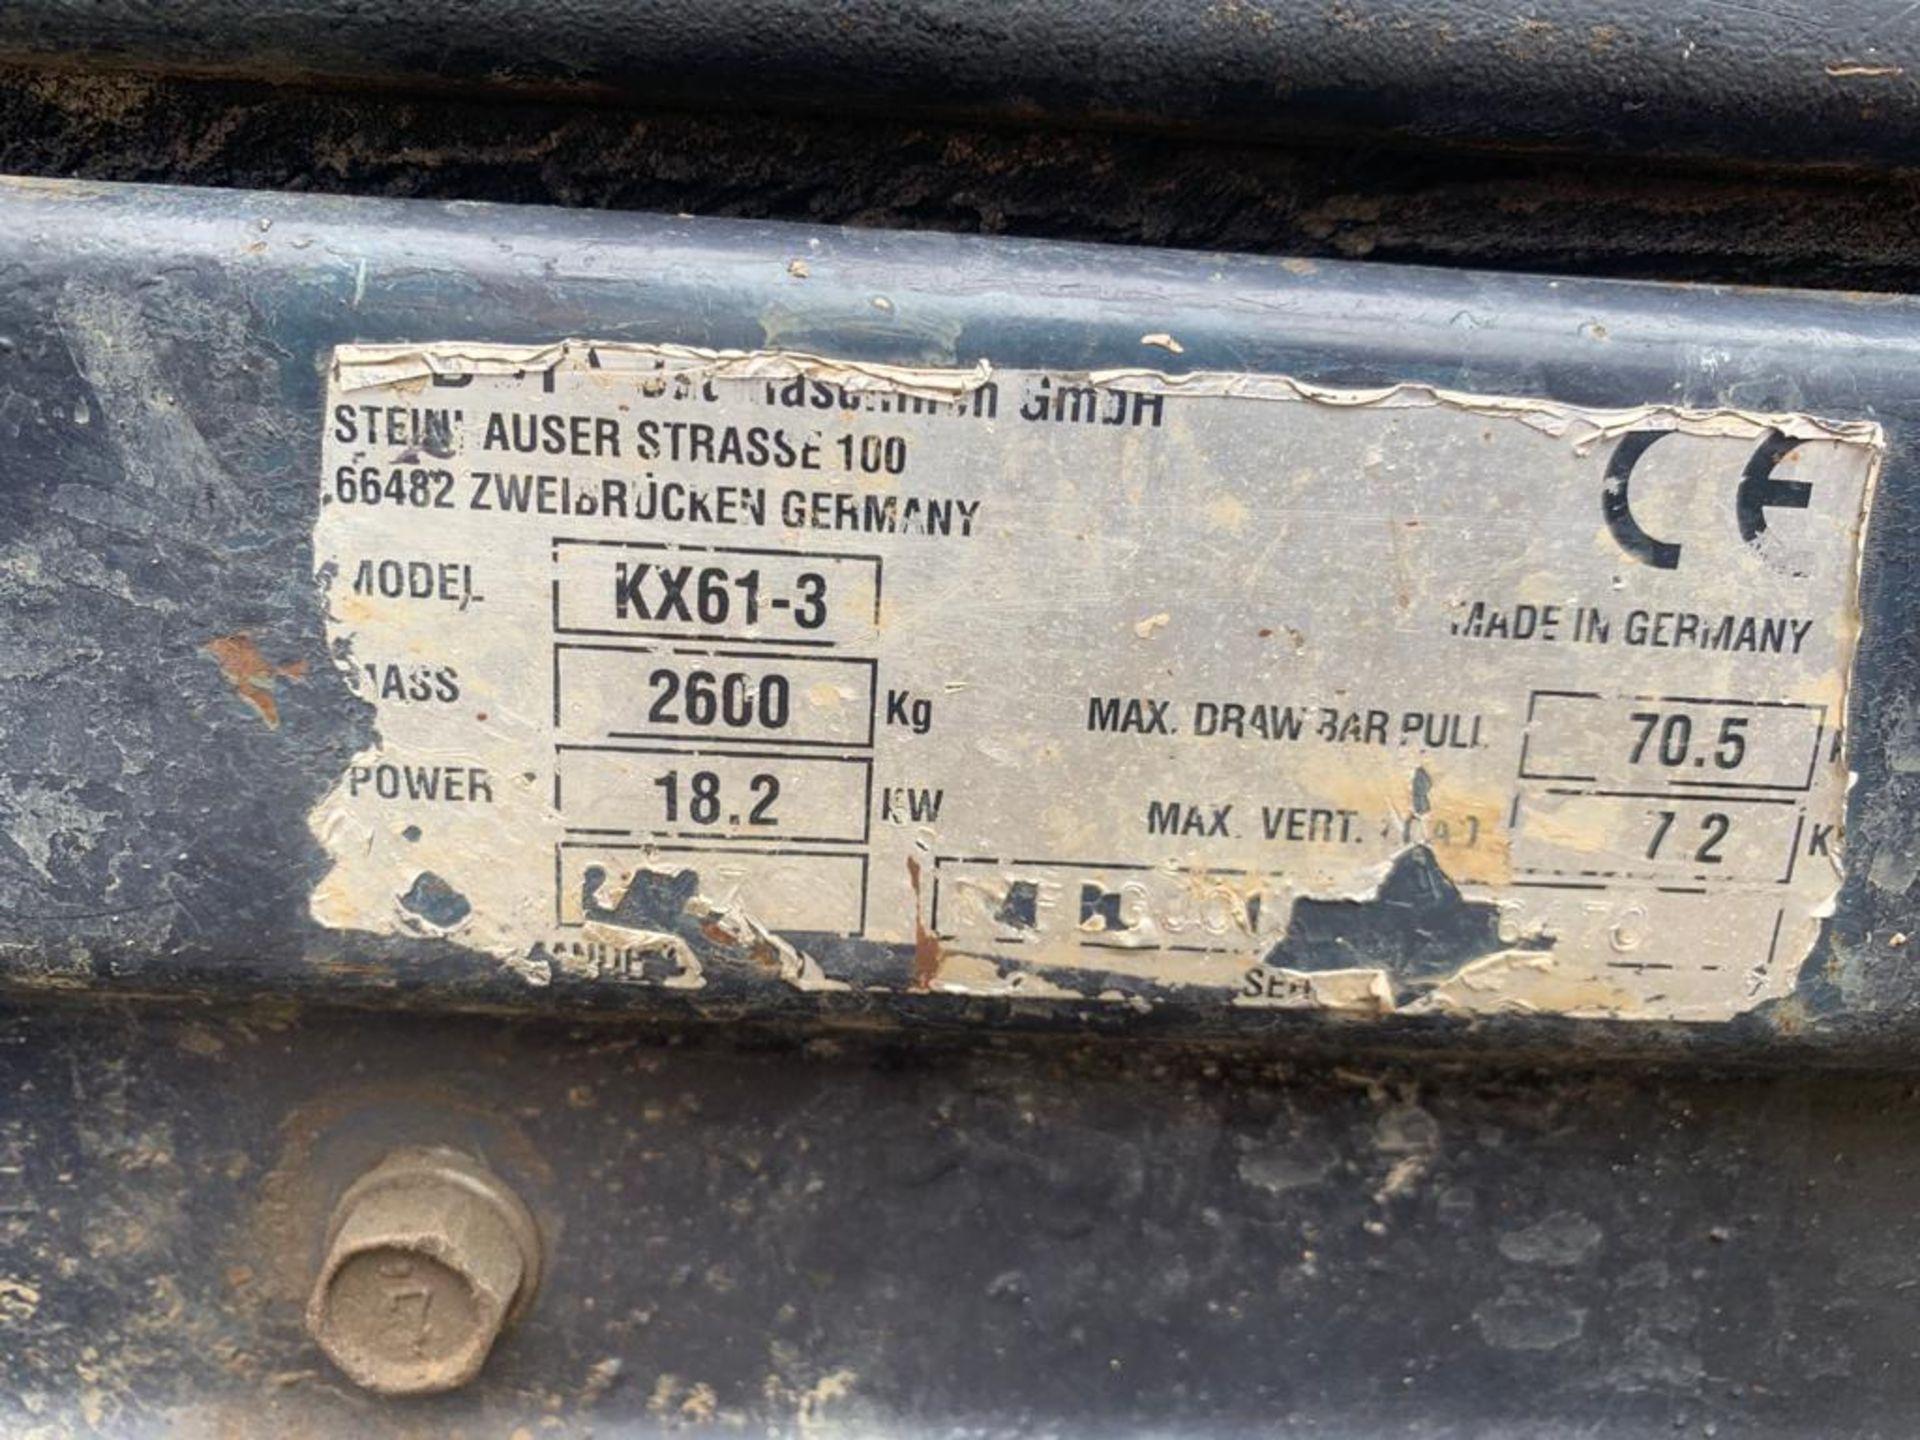 2007 KUBOTA KX61-3 2600KG TRACKED DIGGER INCLUDING 2 BUCKETS - Image 19 of 19